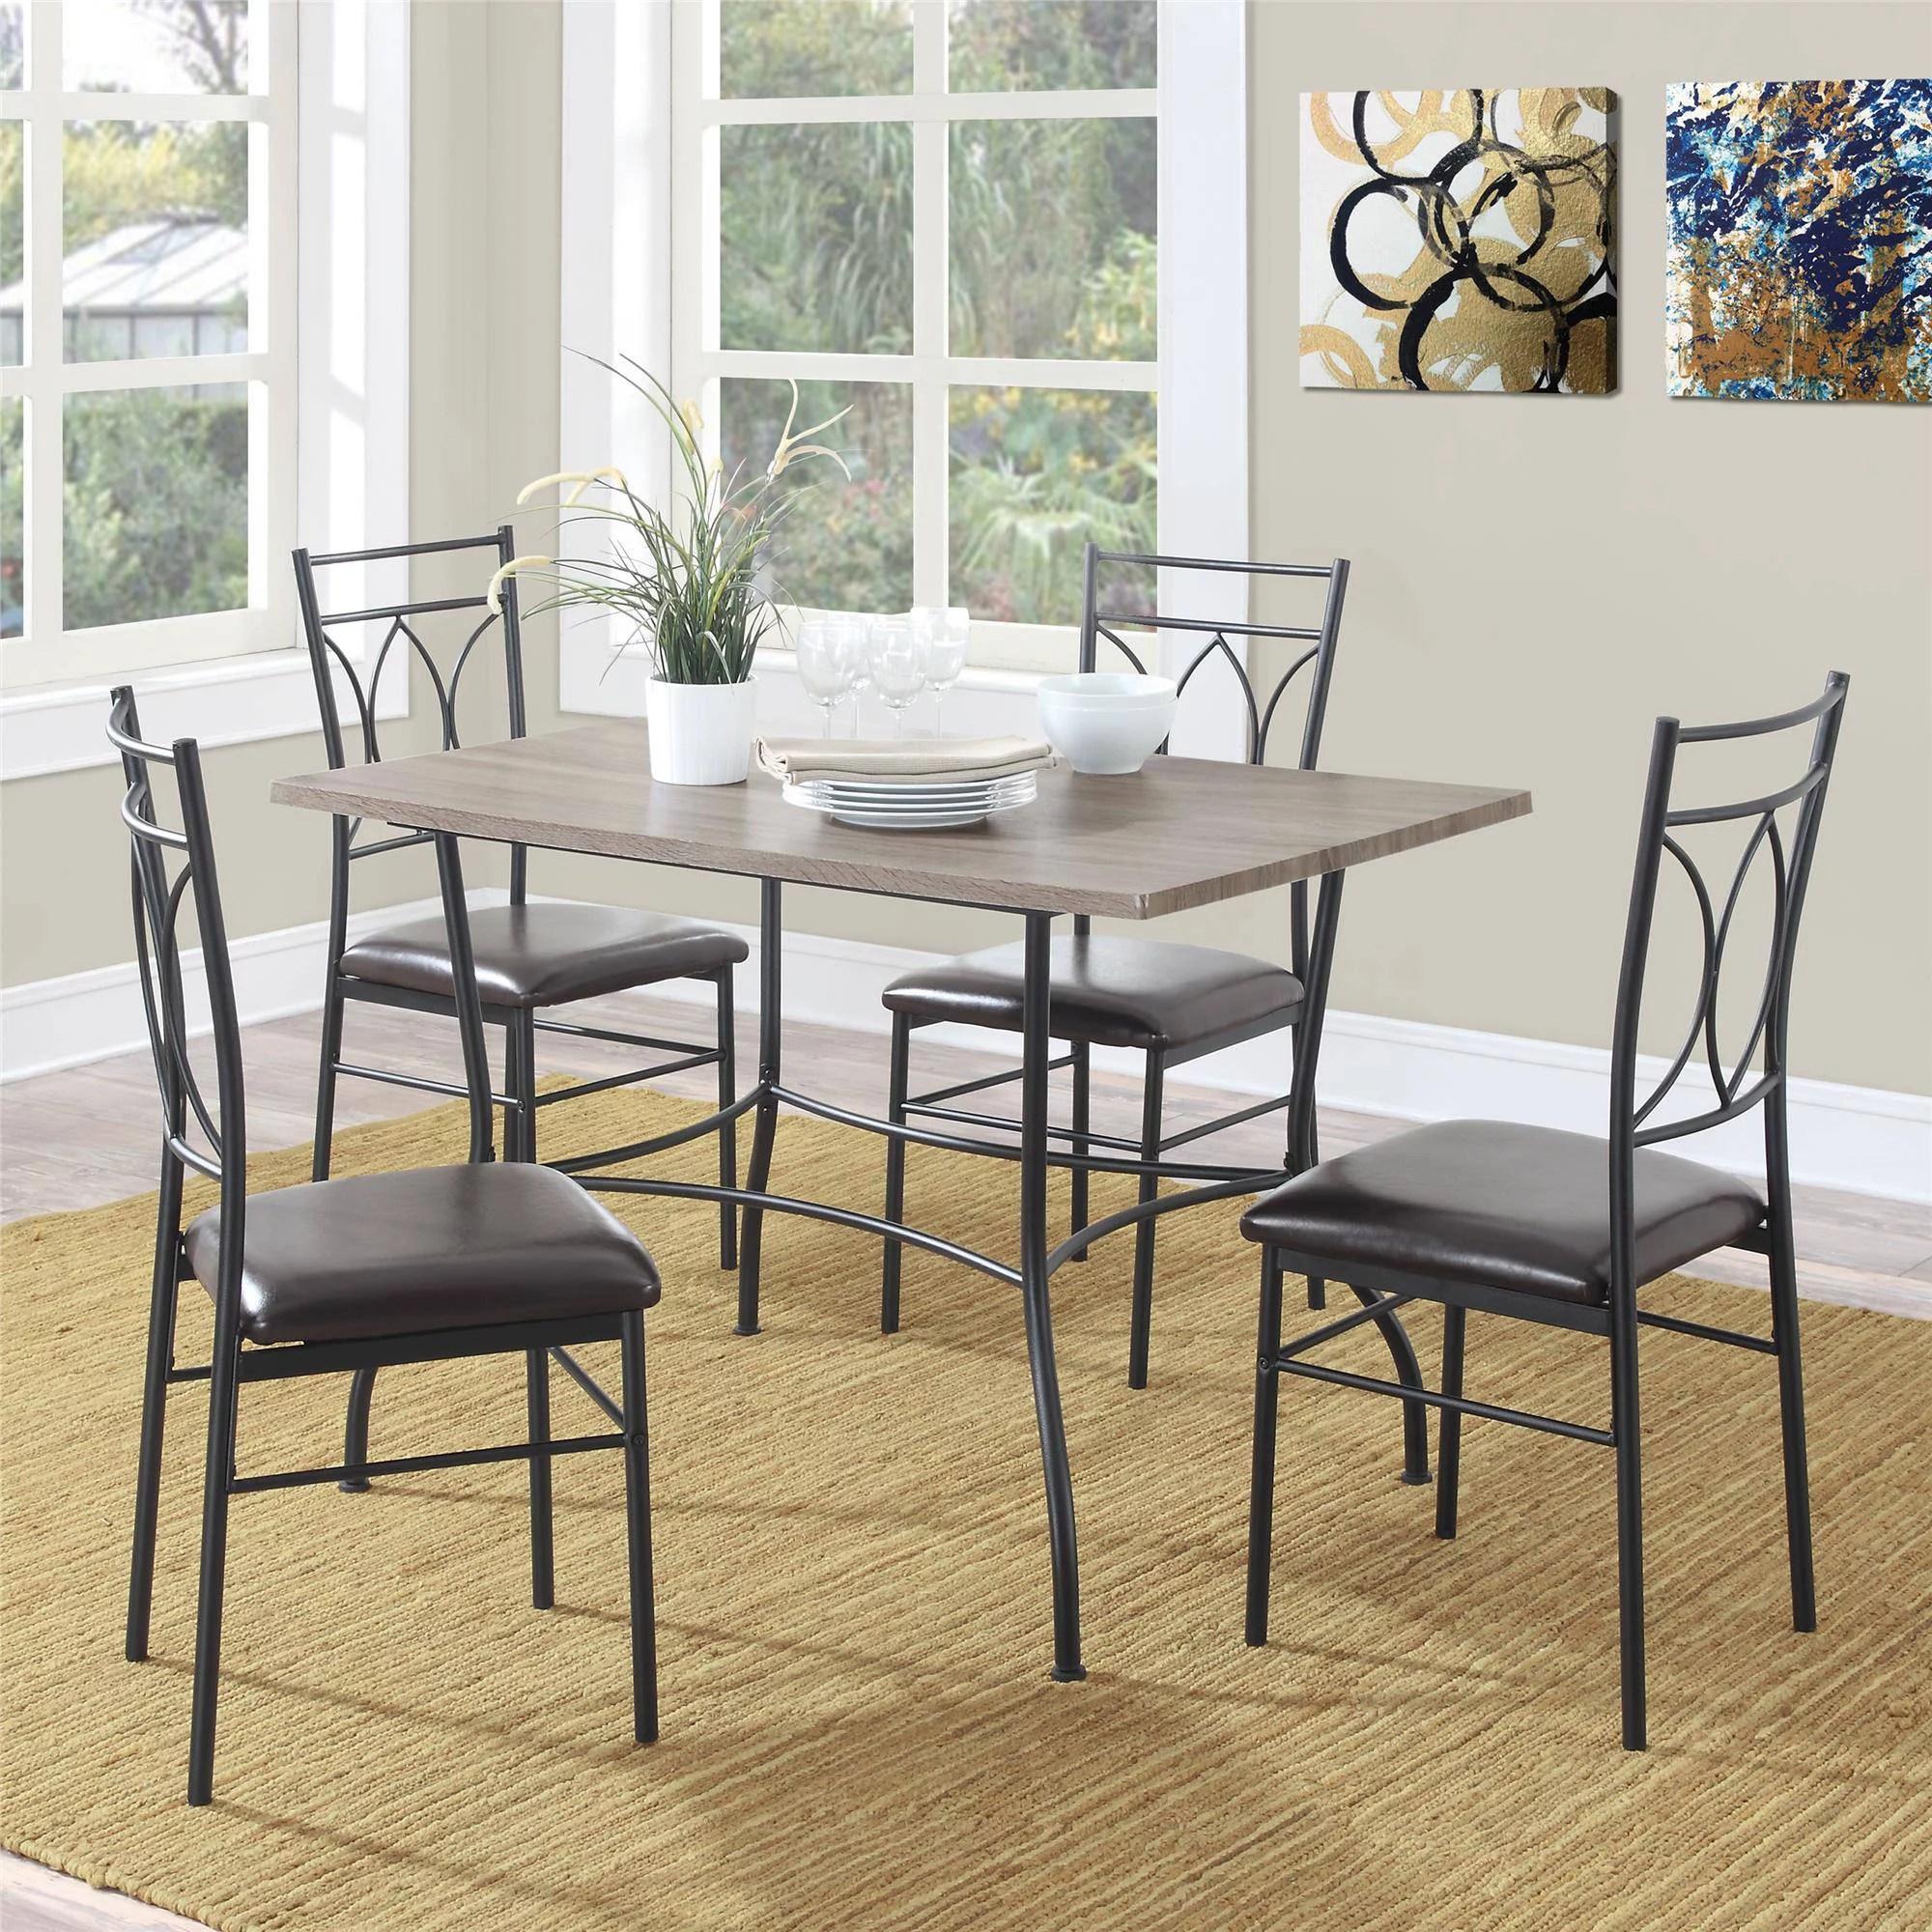 metal kitchen table sets tile backsplash ideas dorel living shelby 5 piece rustic wood and dining set walmart com